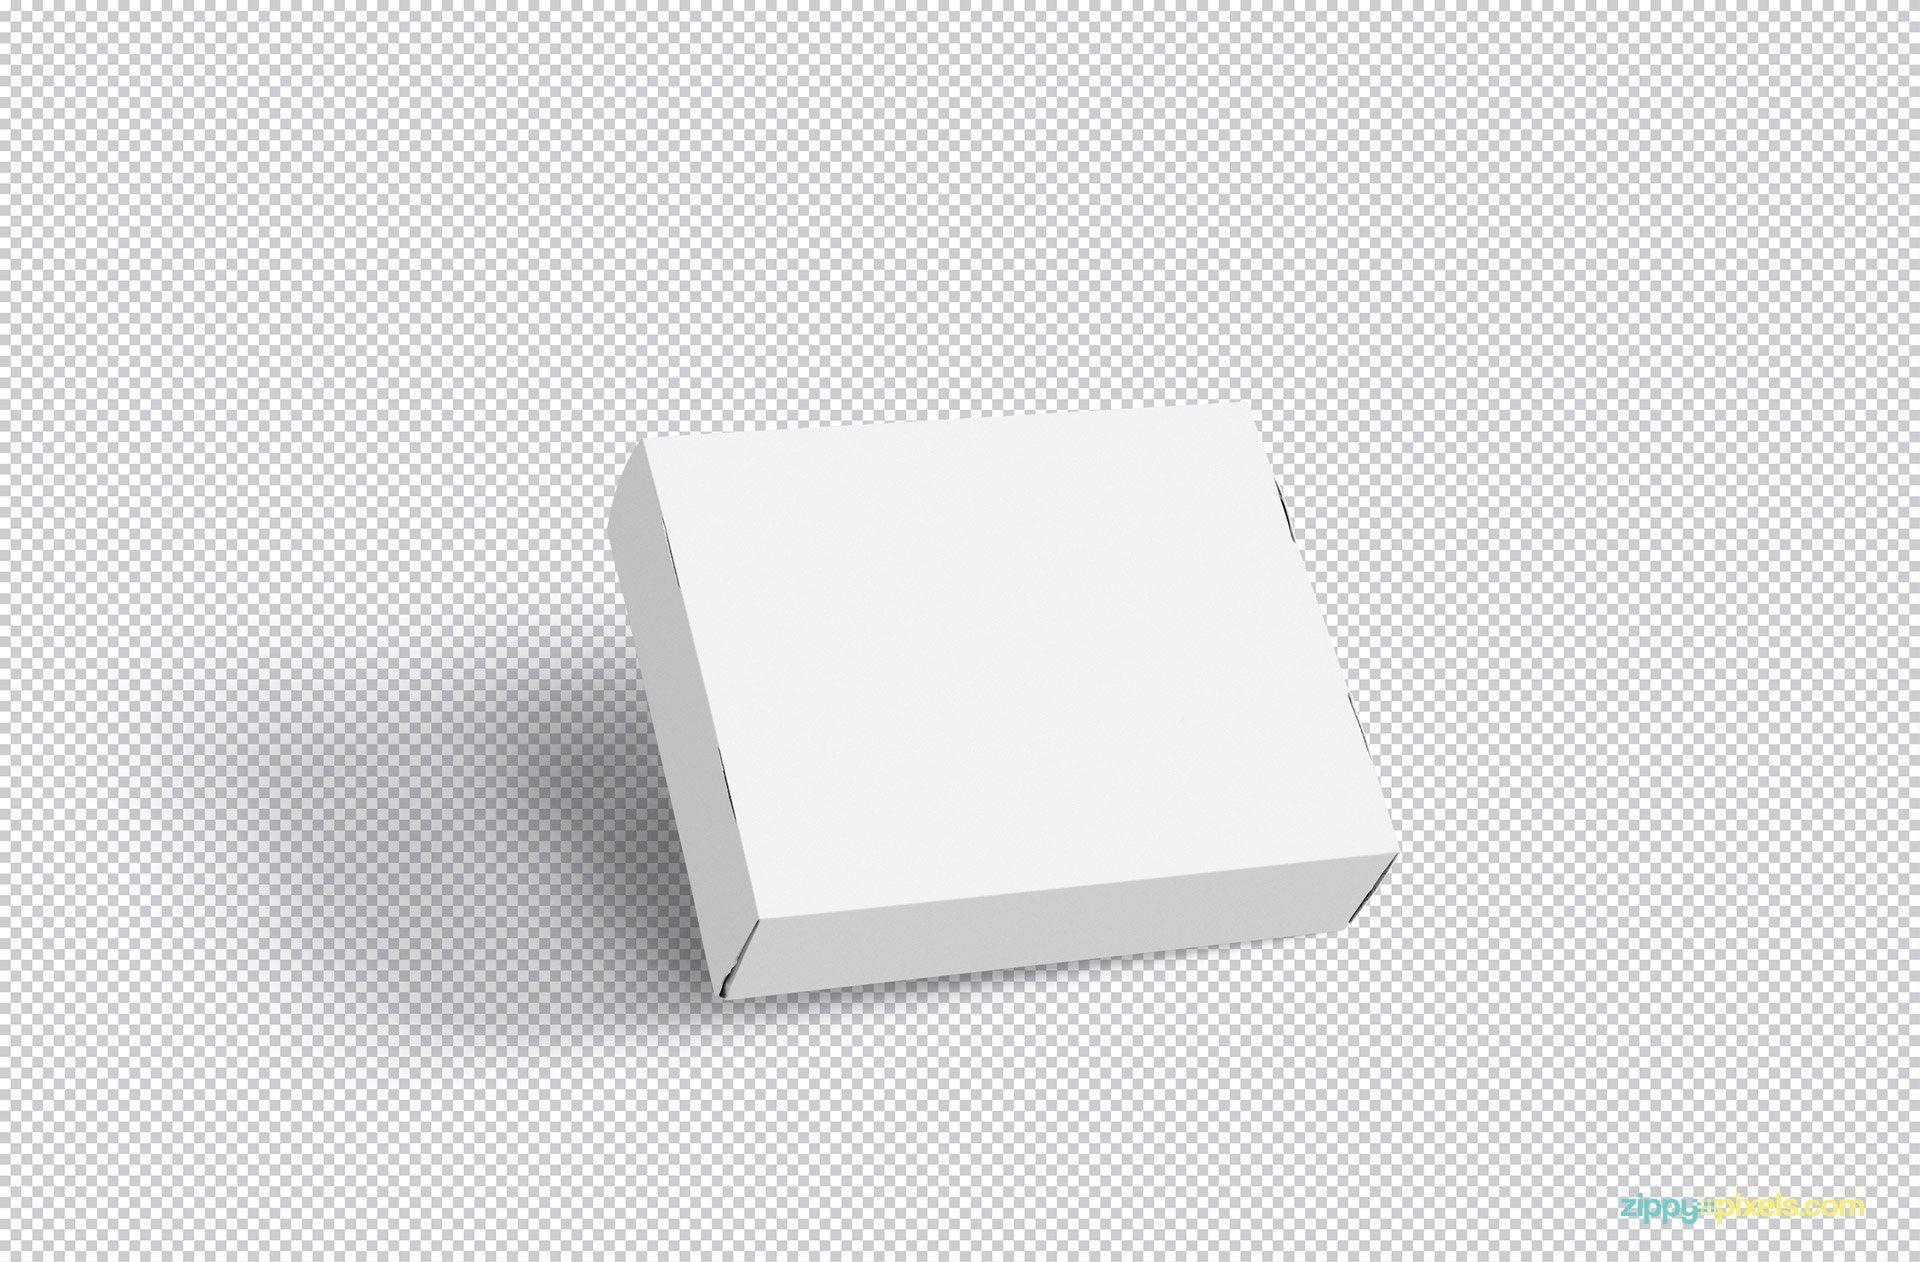 Download Free Gorgeous Box Packaging Mockup Zippypixels Box Packaging Packaging Mockup Free Packaging Mockup